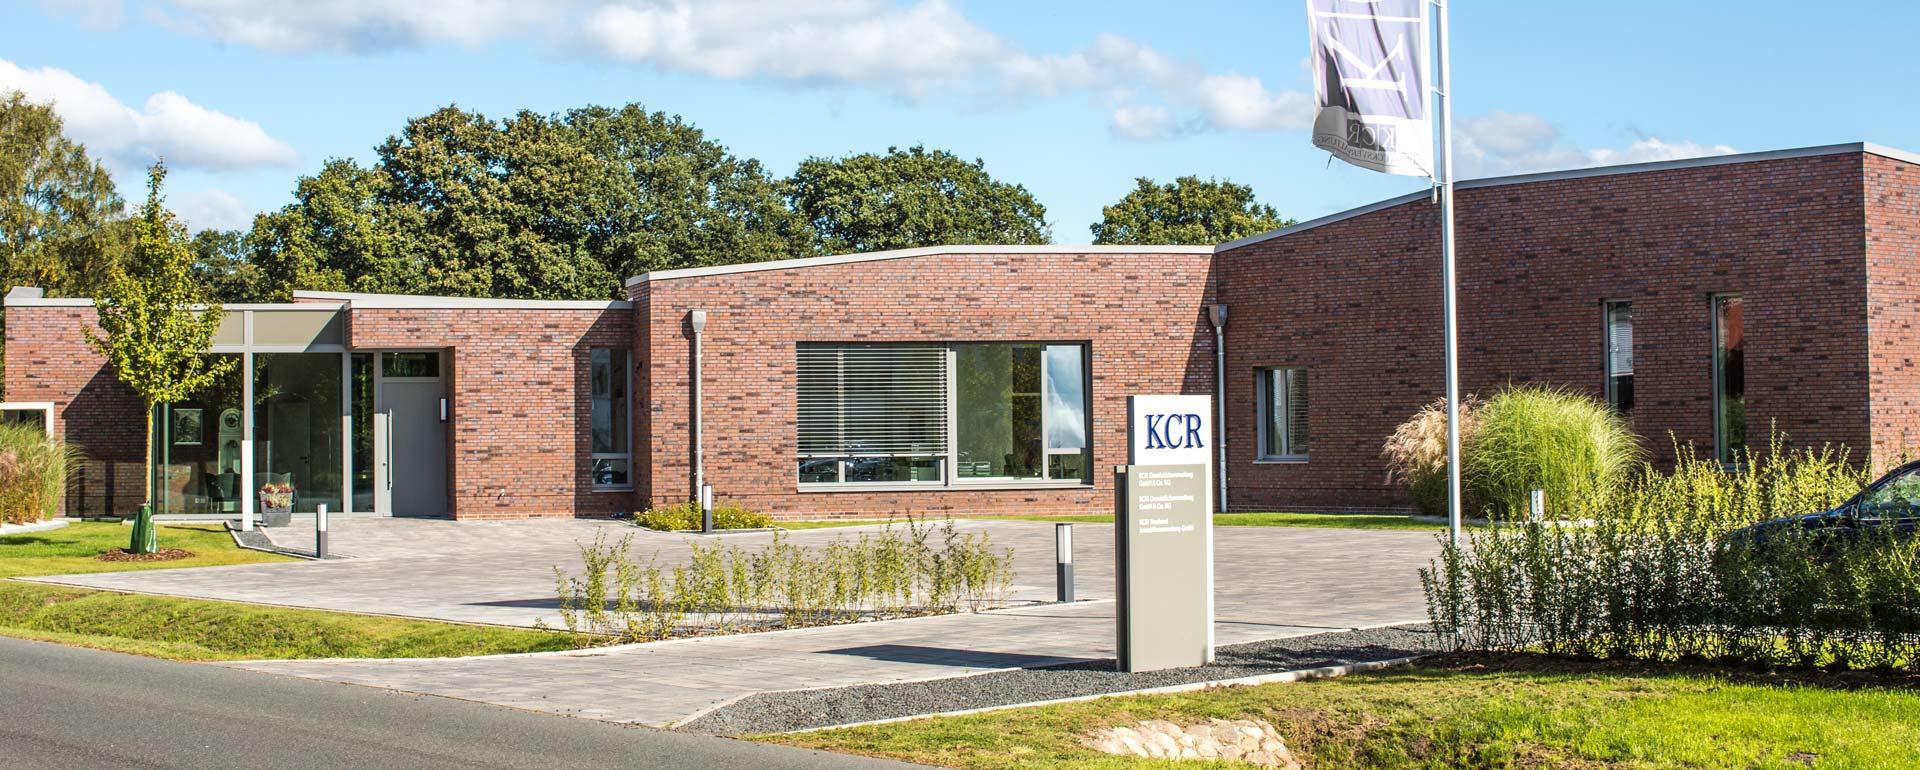 KCR Grundstücksverwaltung – Mieten – Gewerbeimmobilien – Verwaltung